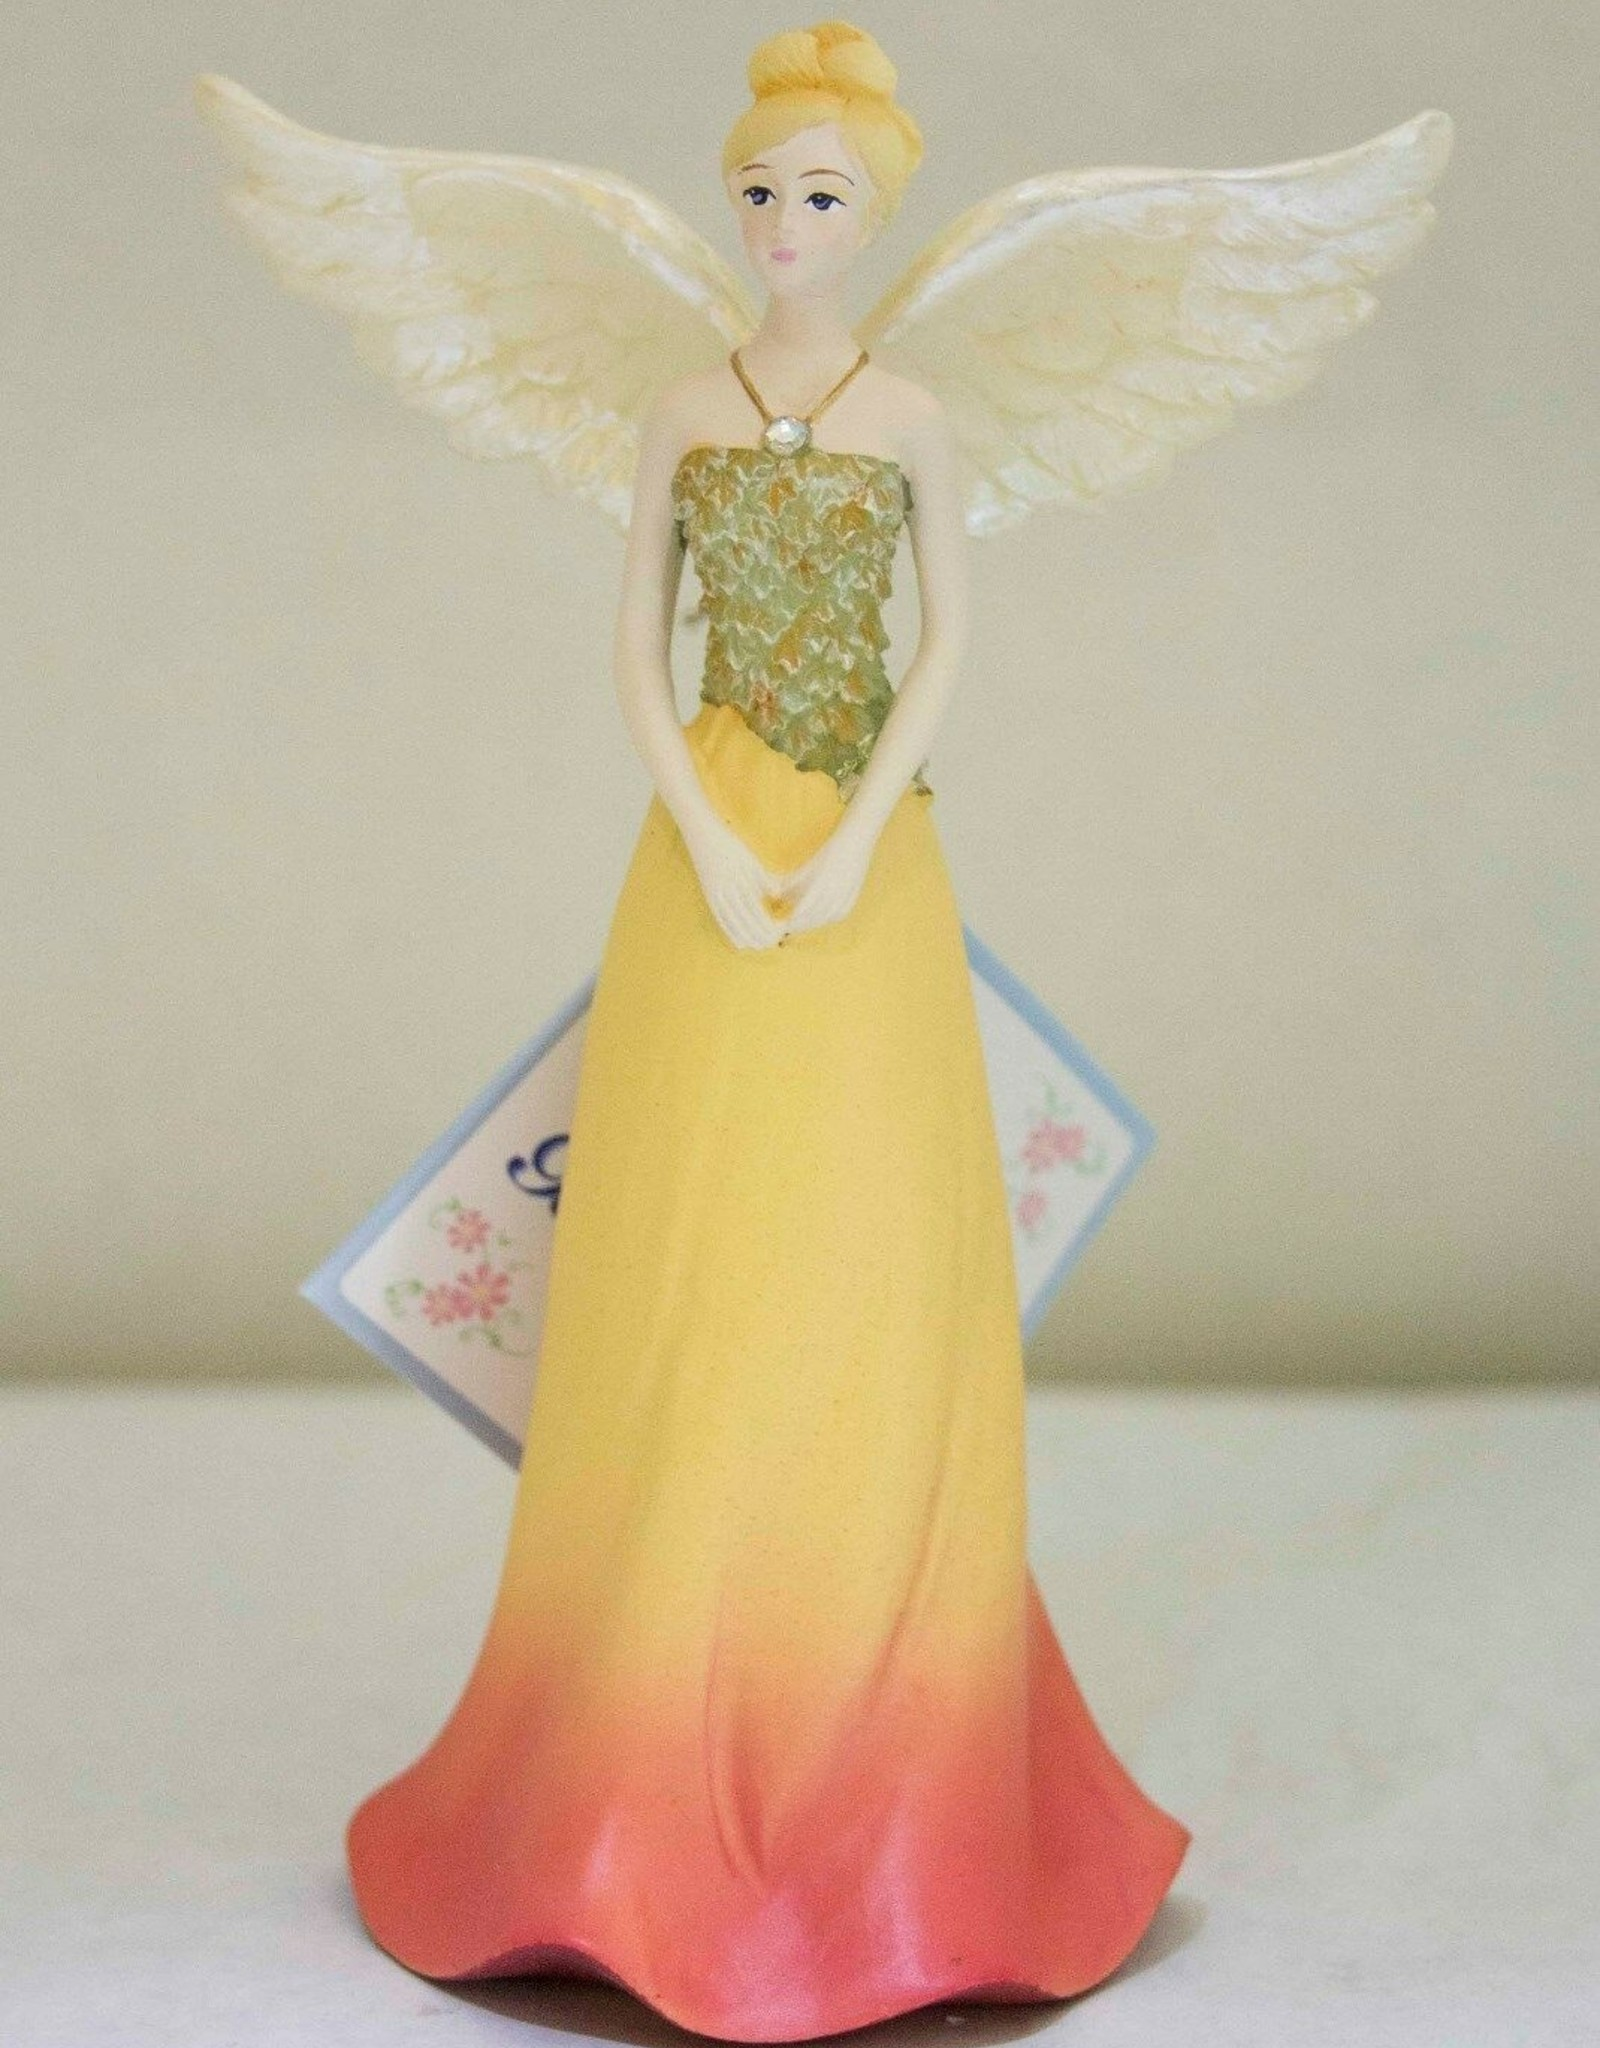 OCTOBER ANGEL FIGURINE